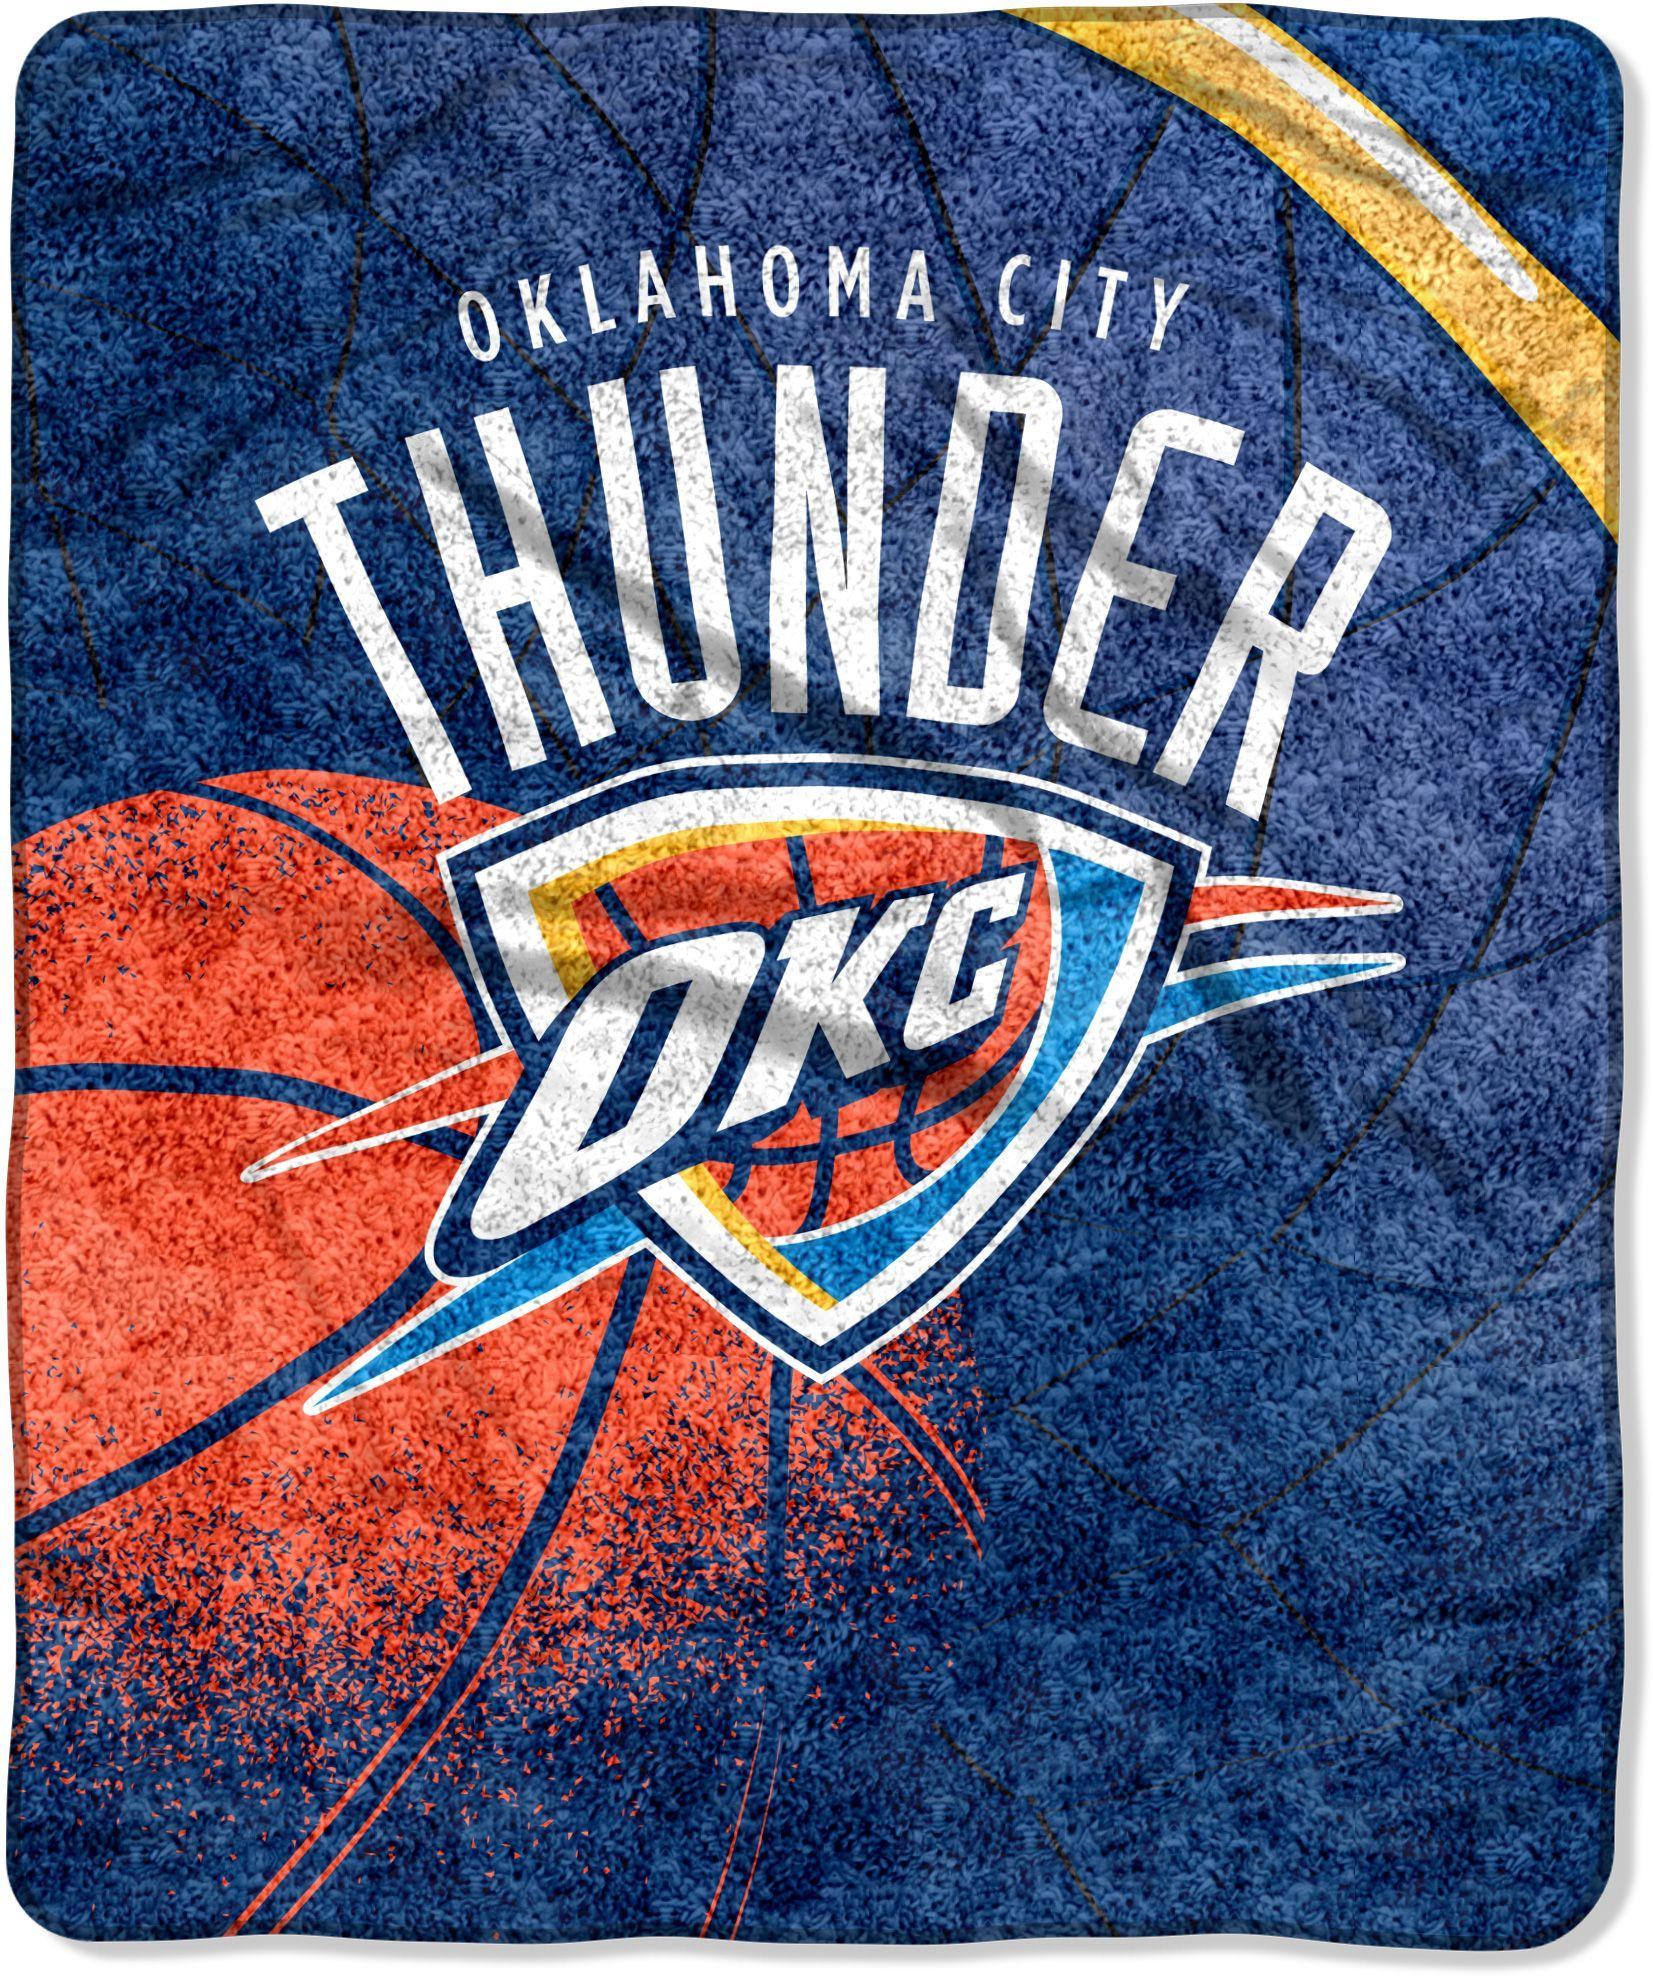 71fe2339f512 Northwest Oklahoma City Thunder Sherpa Throw, Multi | Products ...